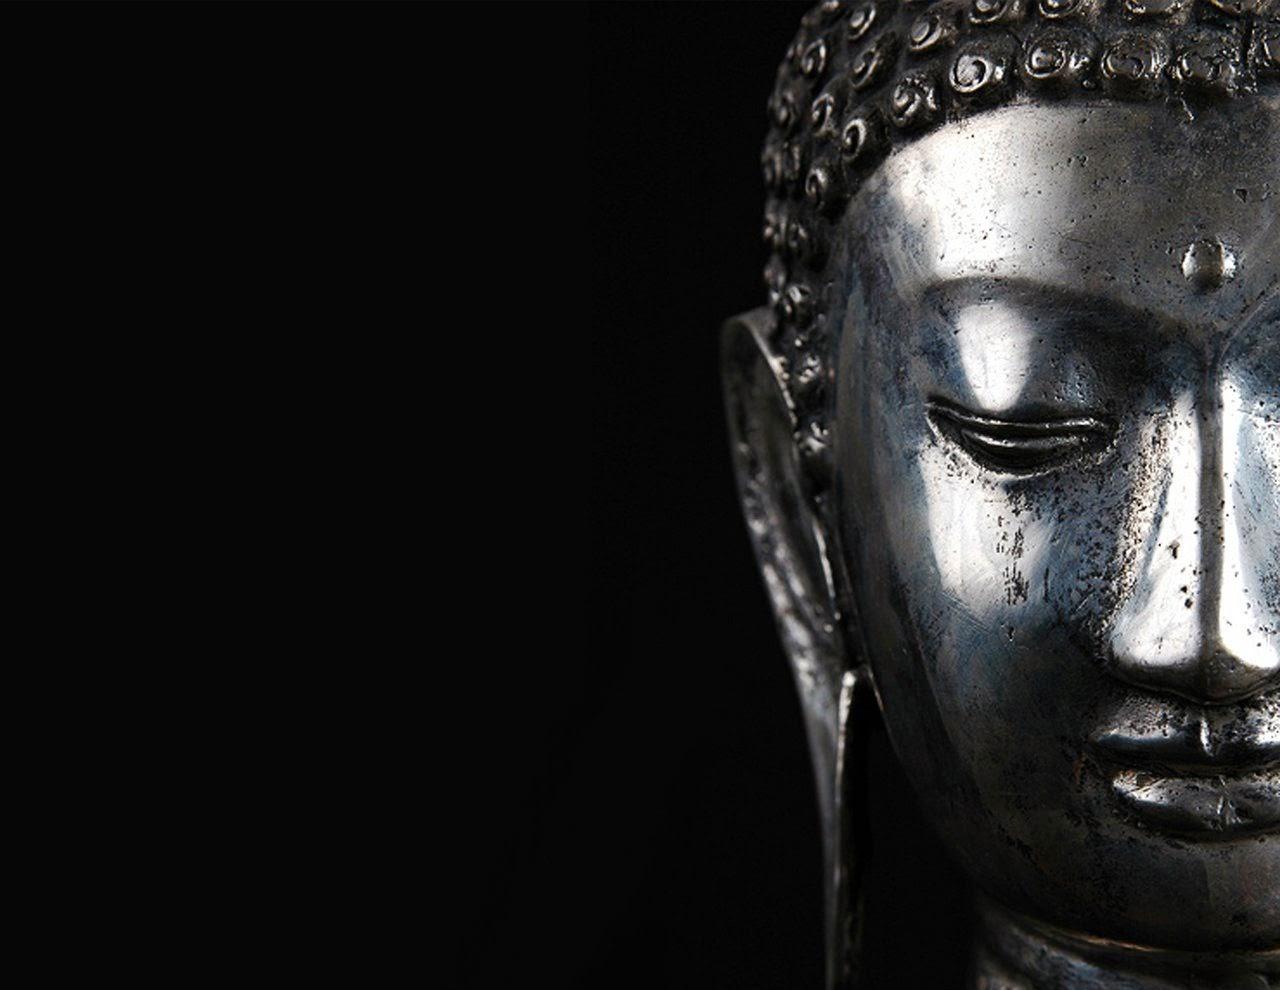 49+ Buddha Wallpapers HD on WallpaperSafari